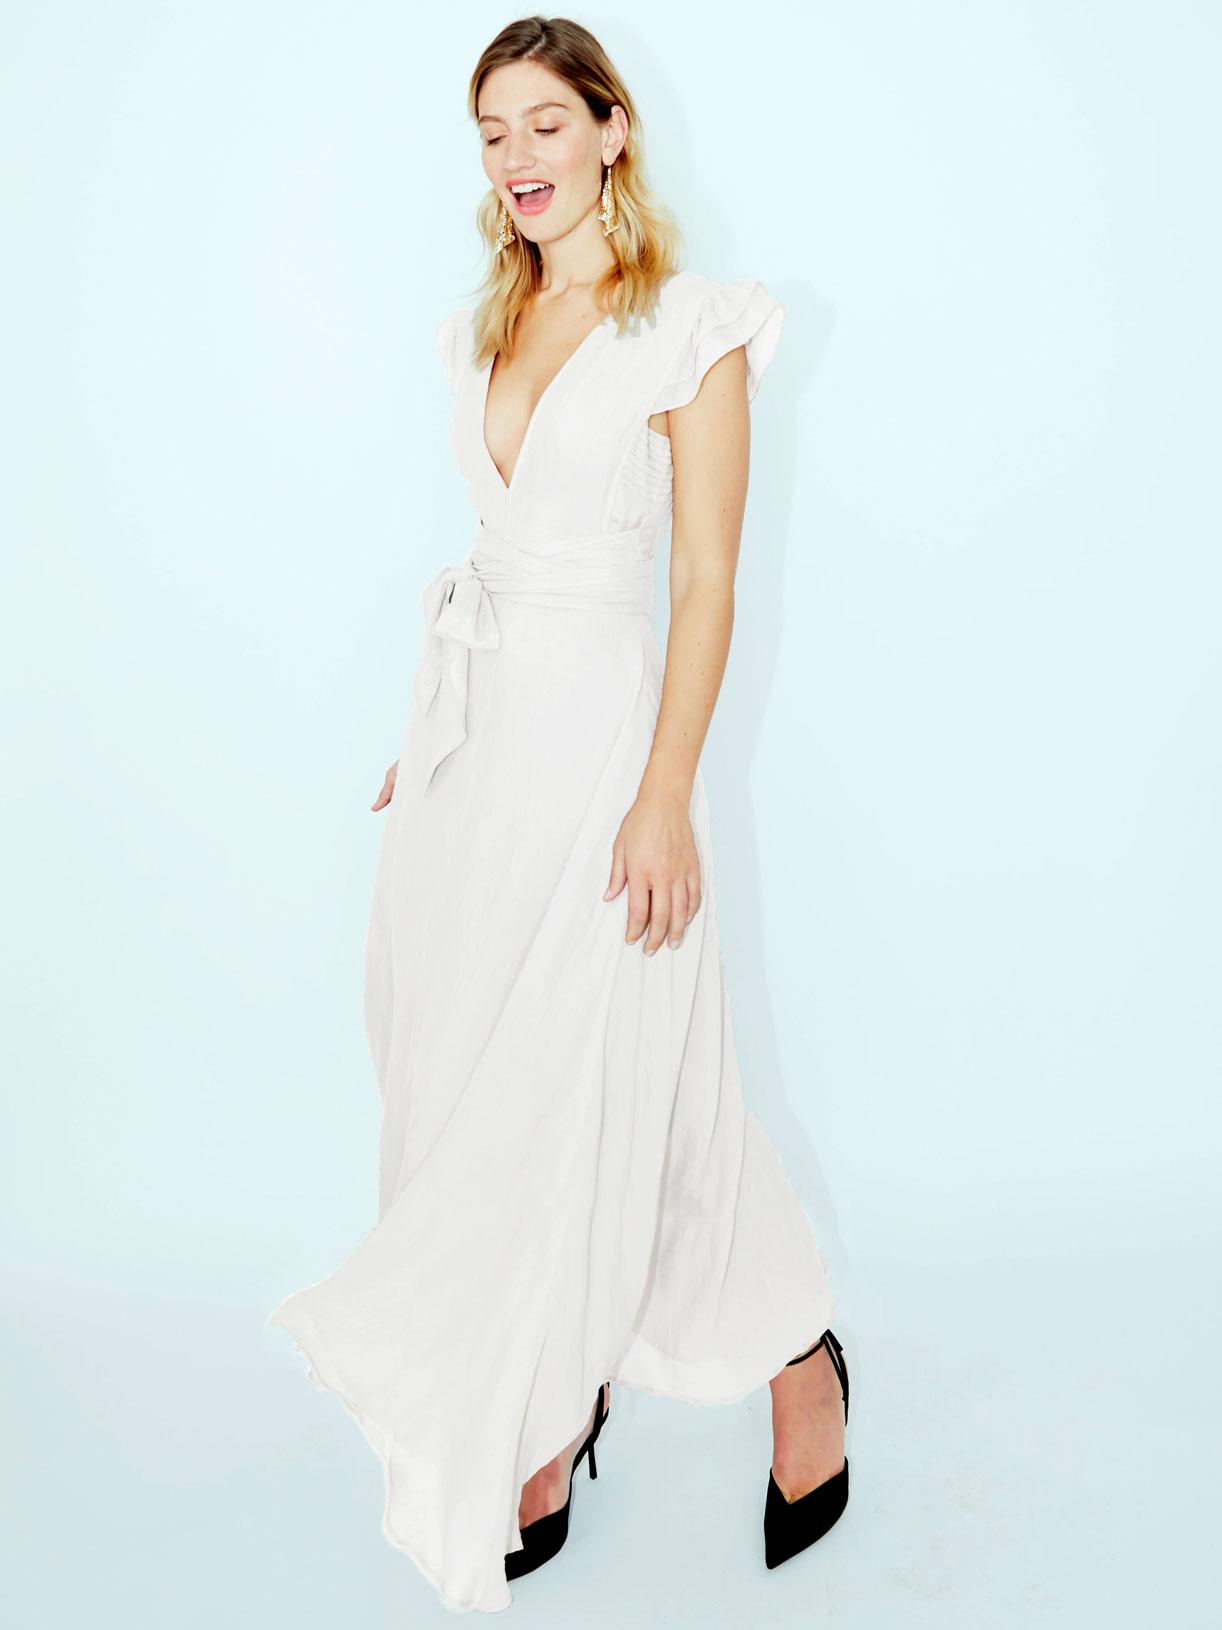 Robe pour mariage civil longue boheme en lin bio ecoresponsable - Myphilosophy